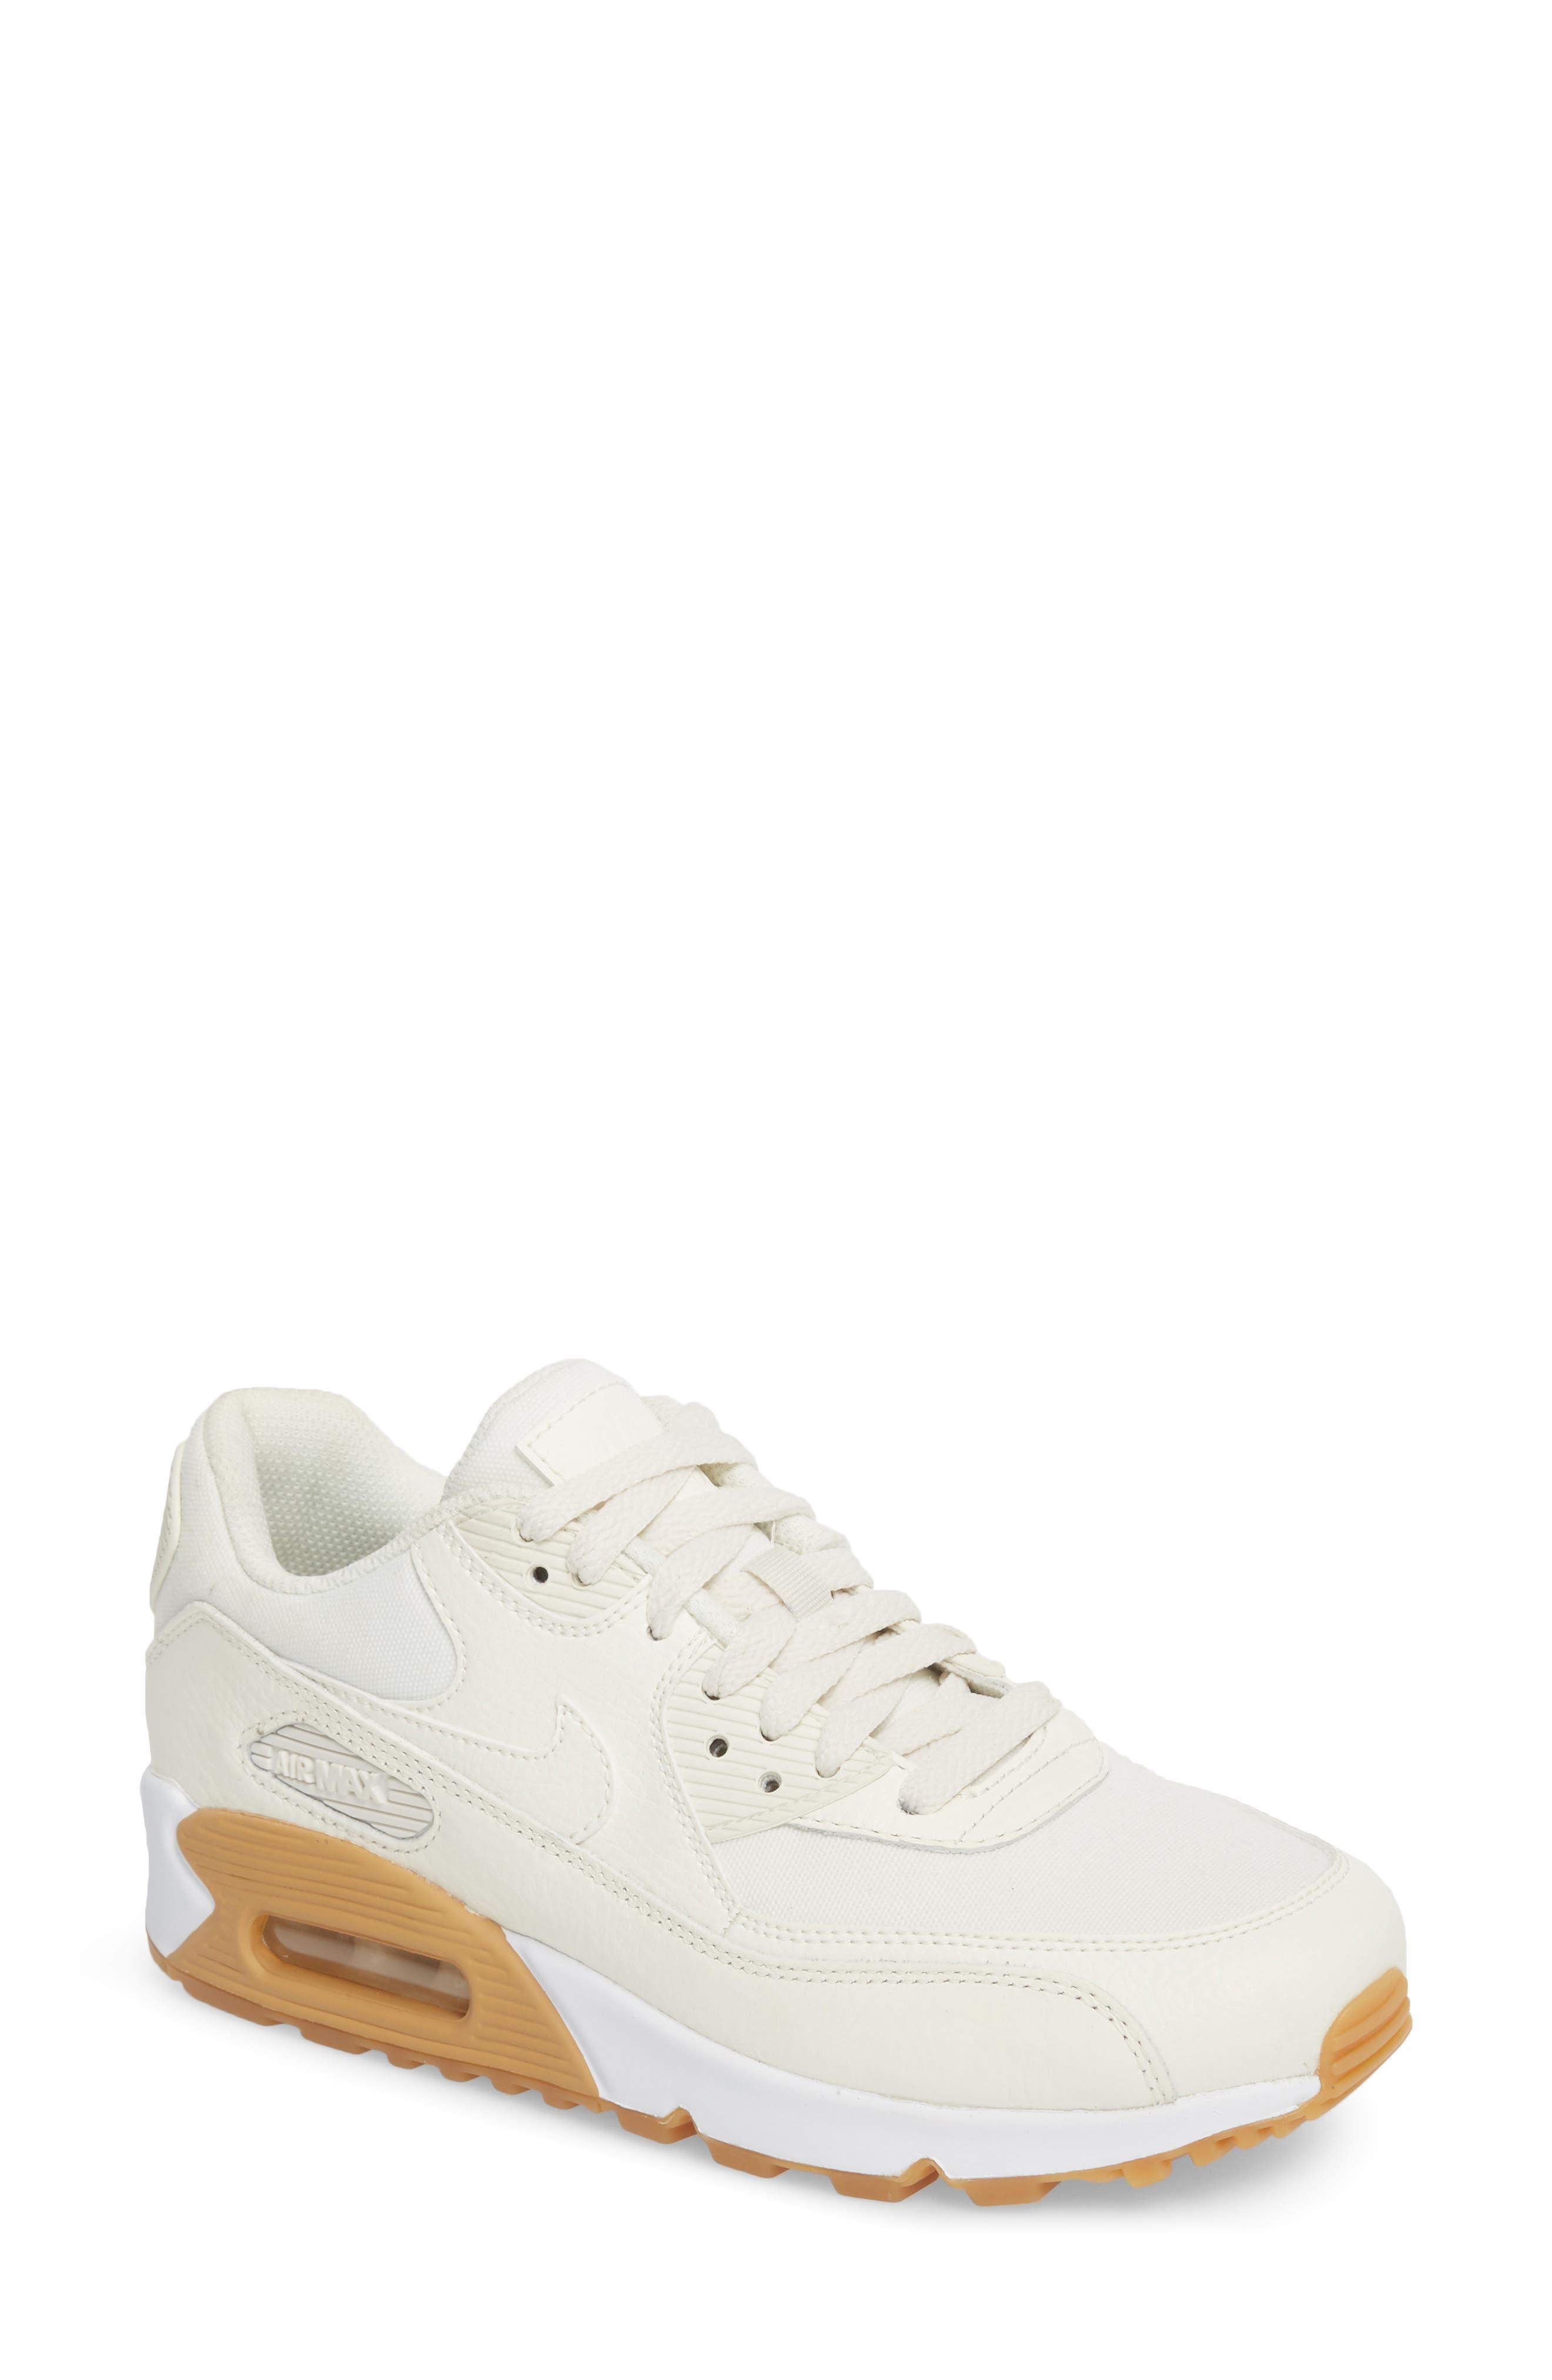 Air Max 90 Premium Sneaker,                         Main,                         color, Sail/ Light Brown/ White